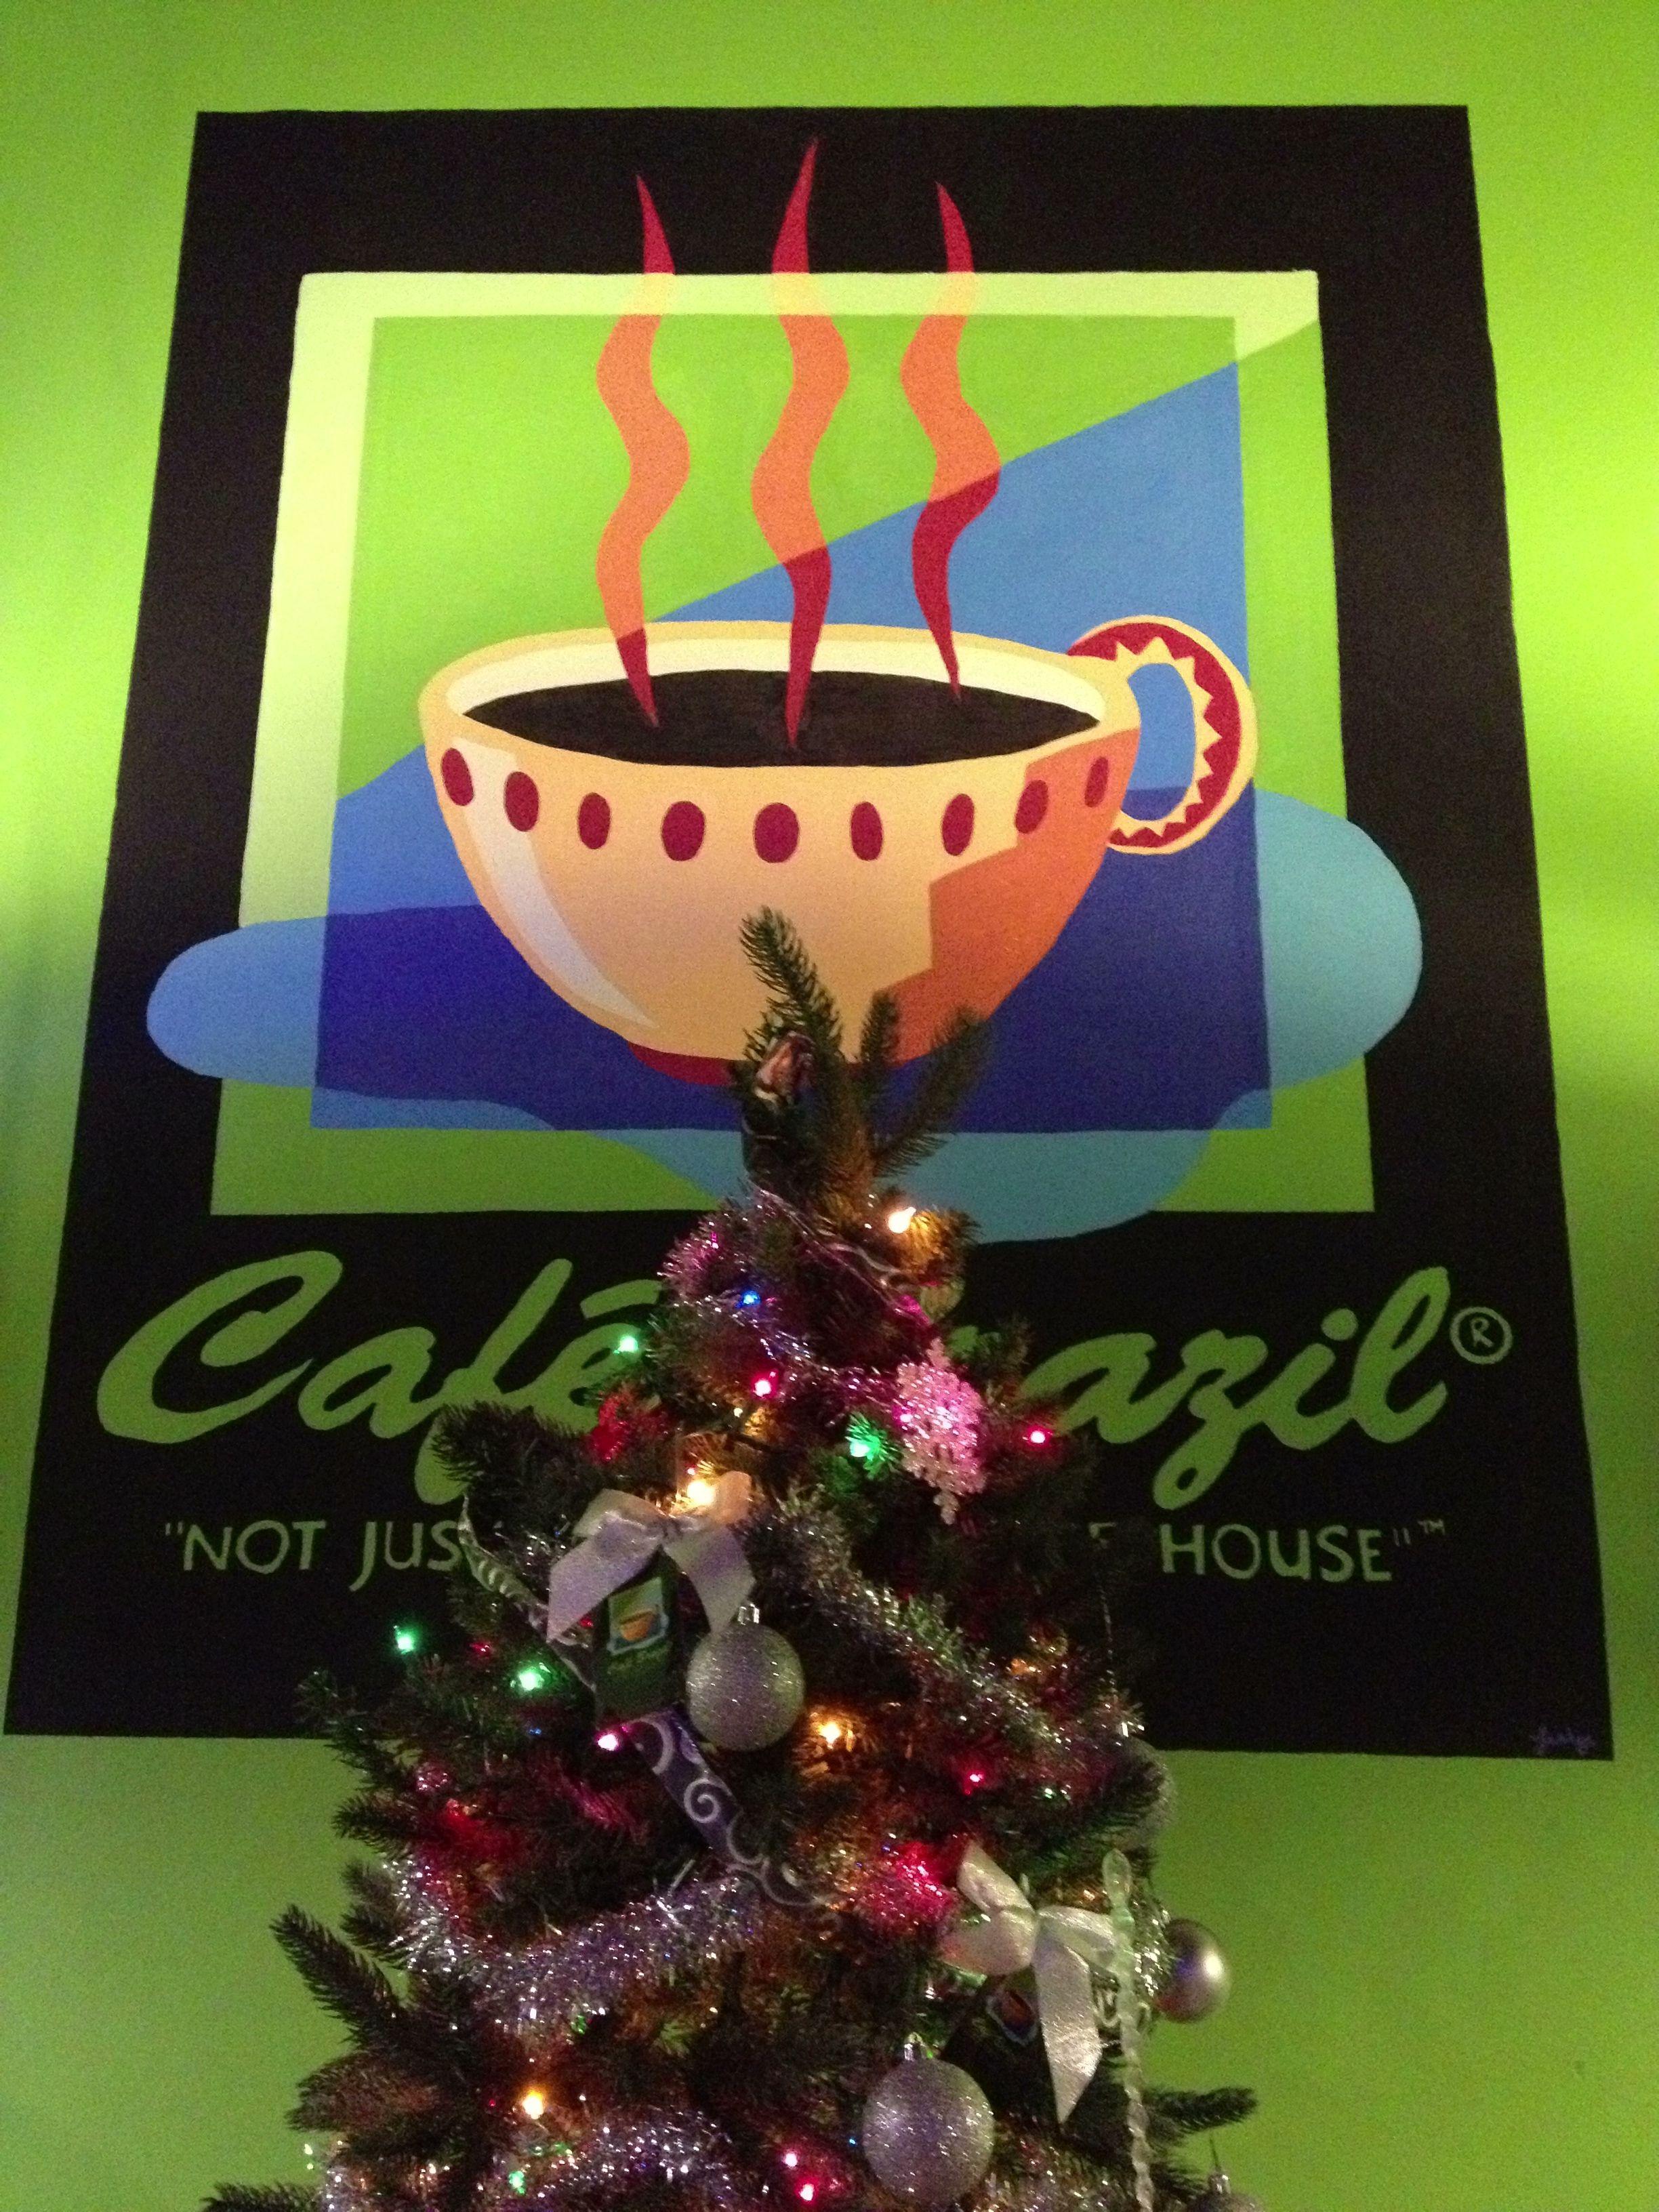 Celebrate the holidays with Cafe Brazil! | Holiday ...